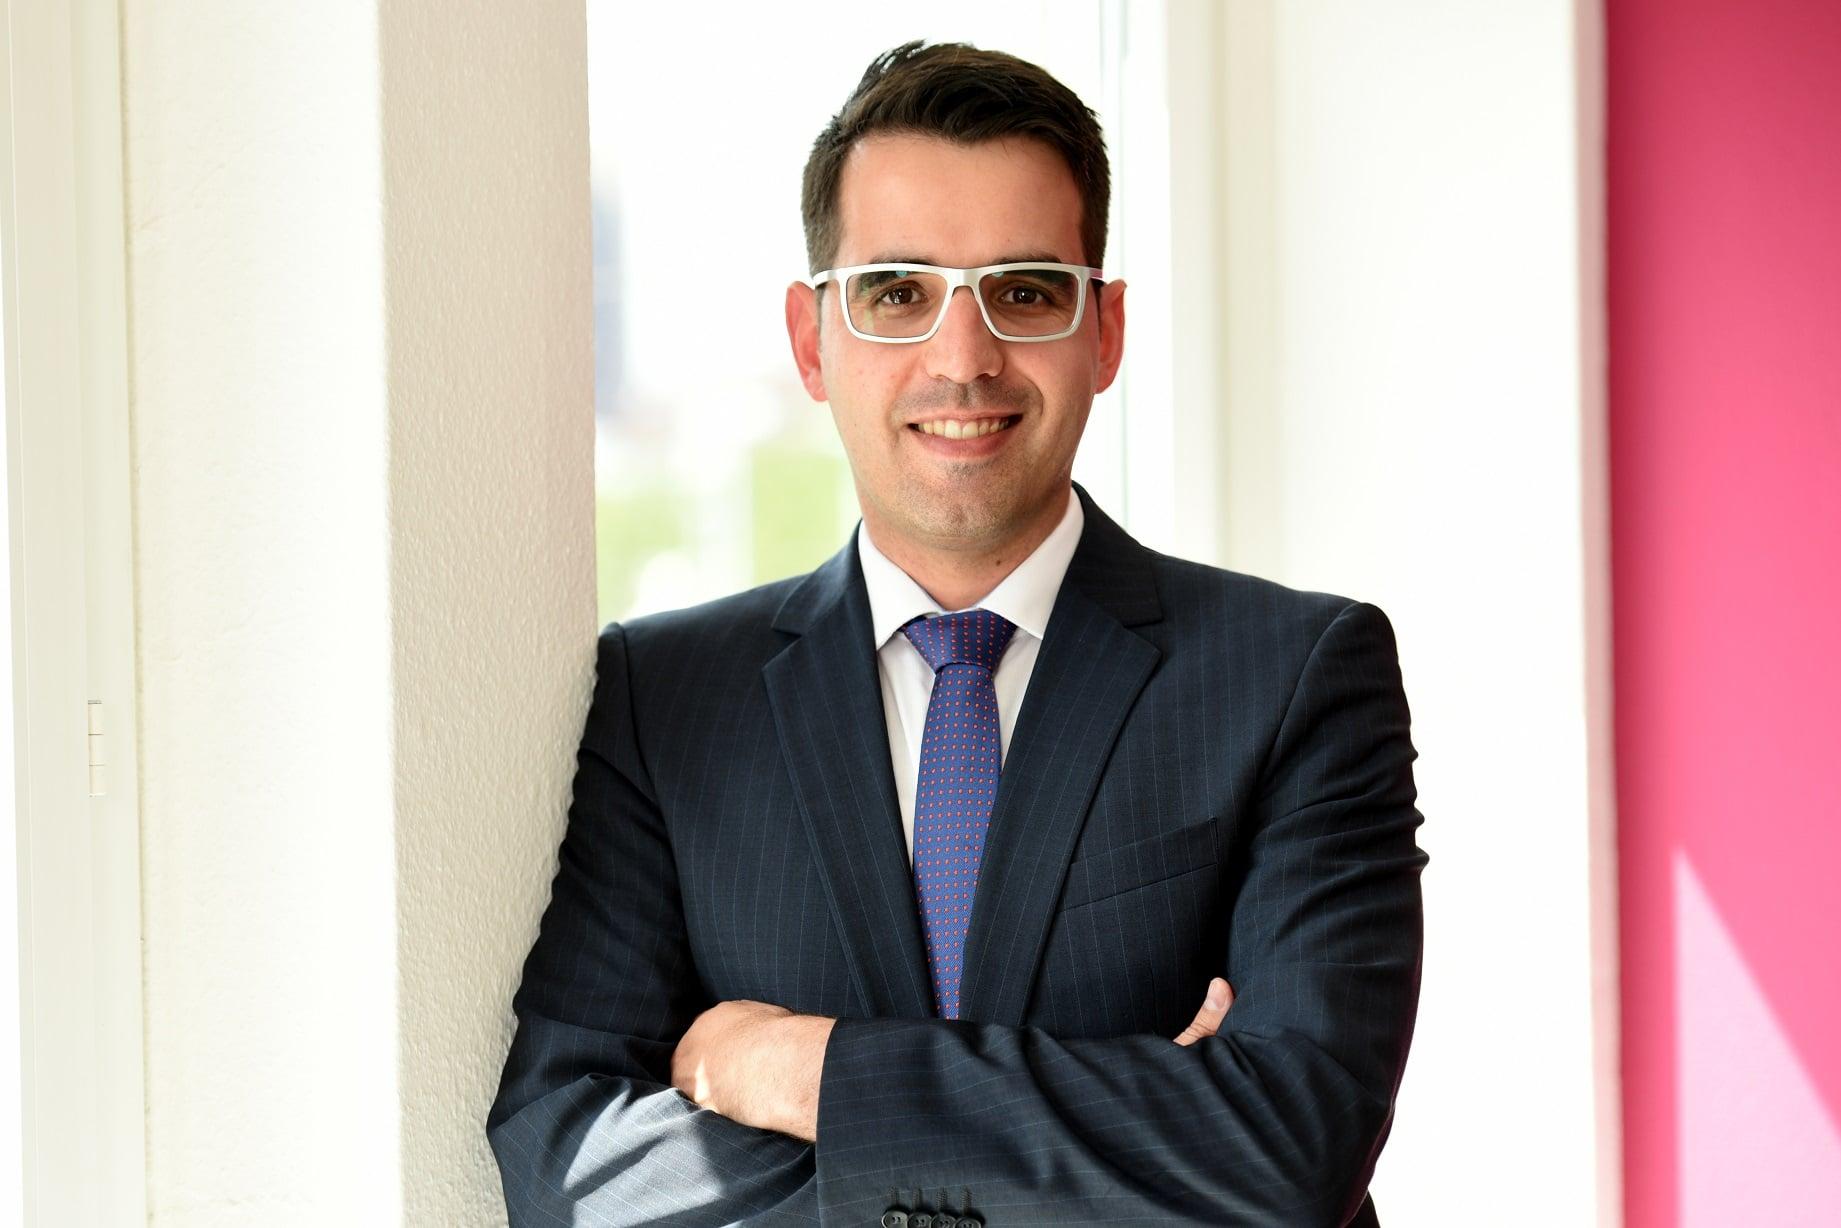 Reto Sidler Greater Zurich Area Brandification Interview